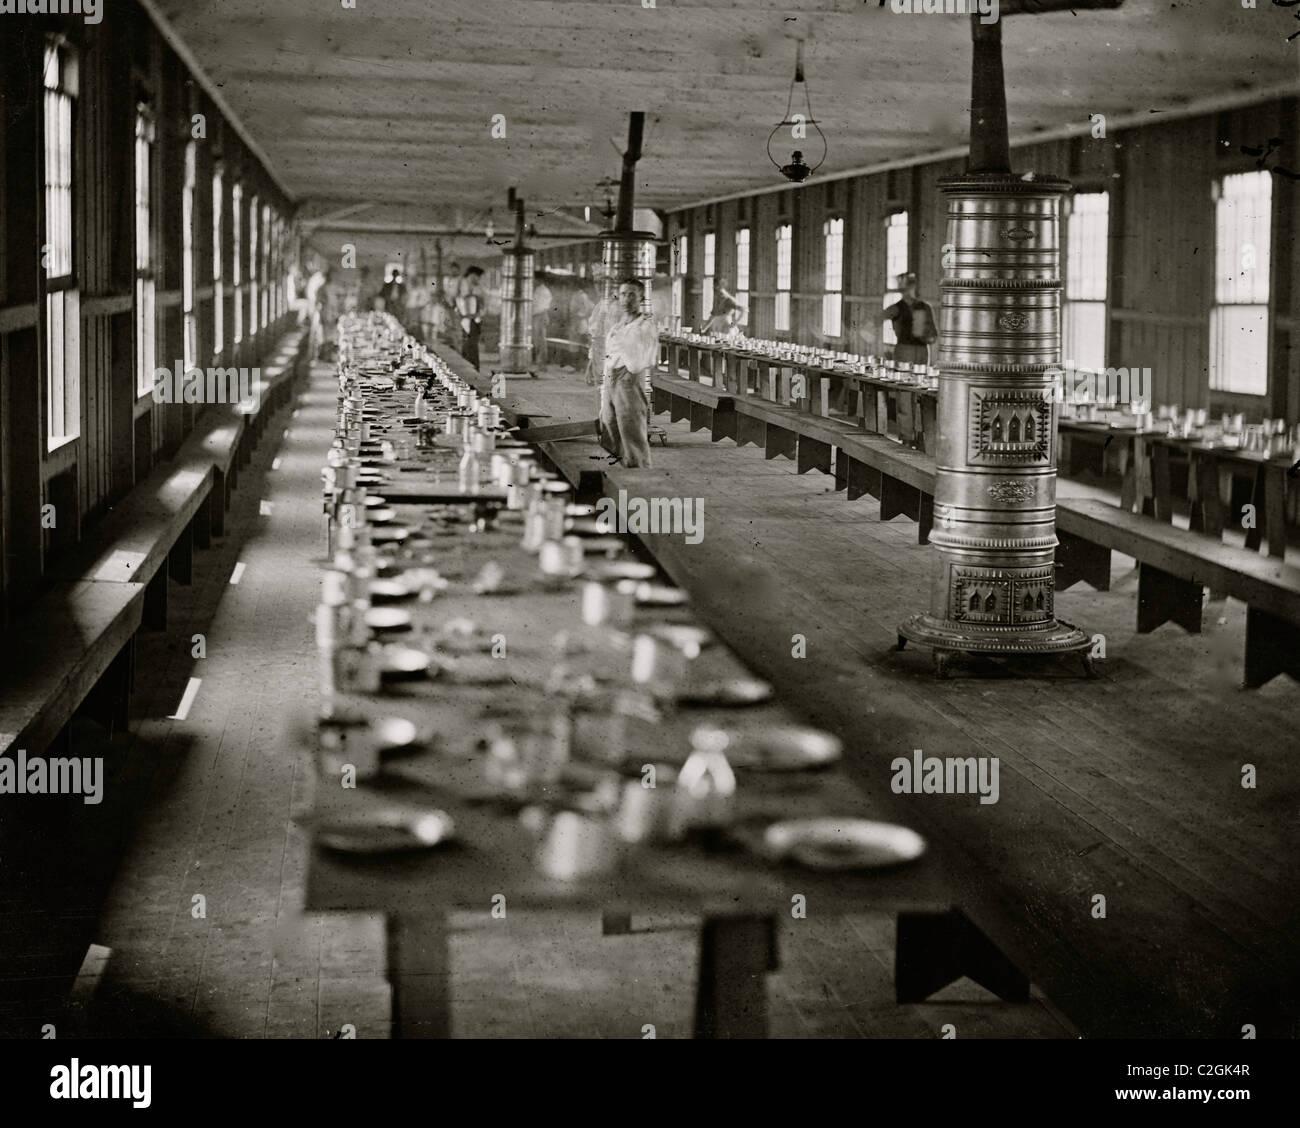 Washington, D.C. Mess hall at Harewood Hospital, heated by elaborate stoves - Stock Image